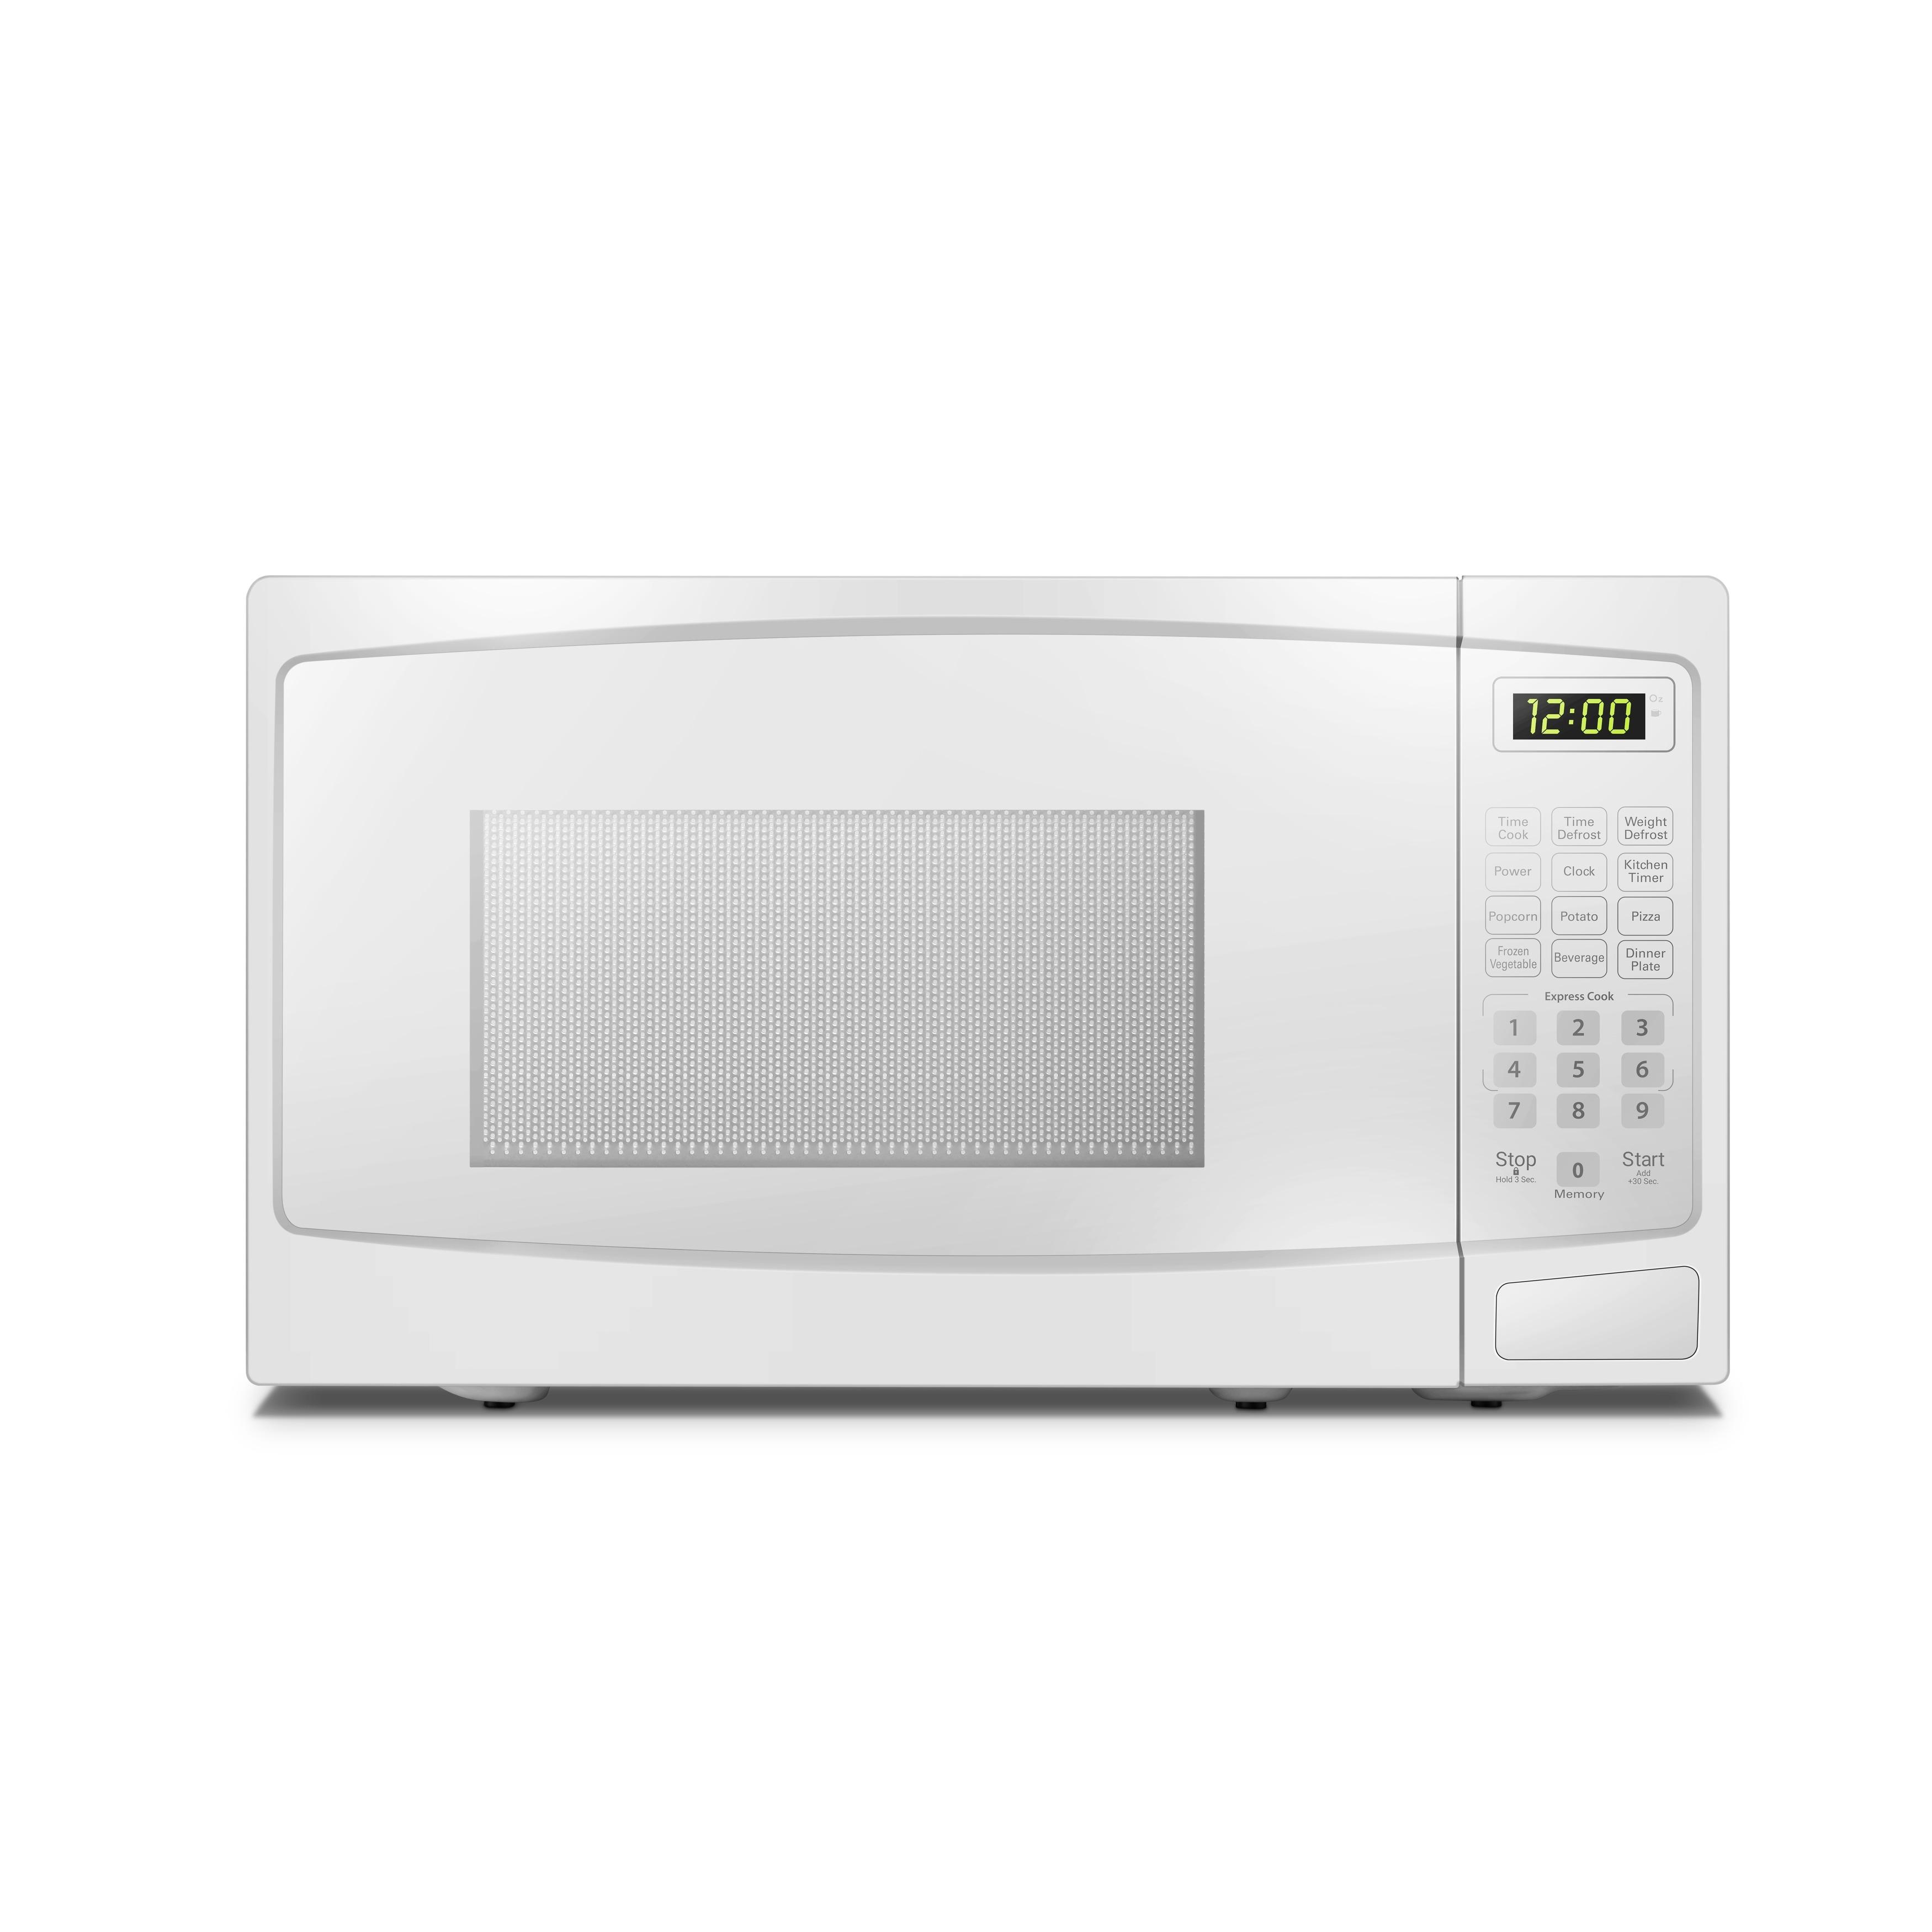 danby 7 cu ft counter top 700 watt microwave in white dbmw0720bww